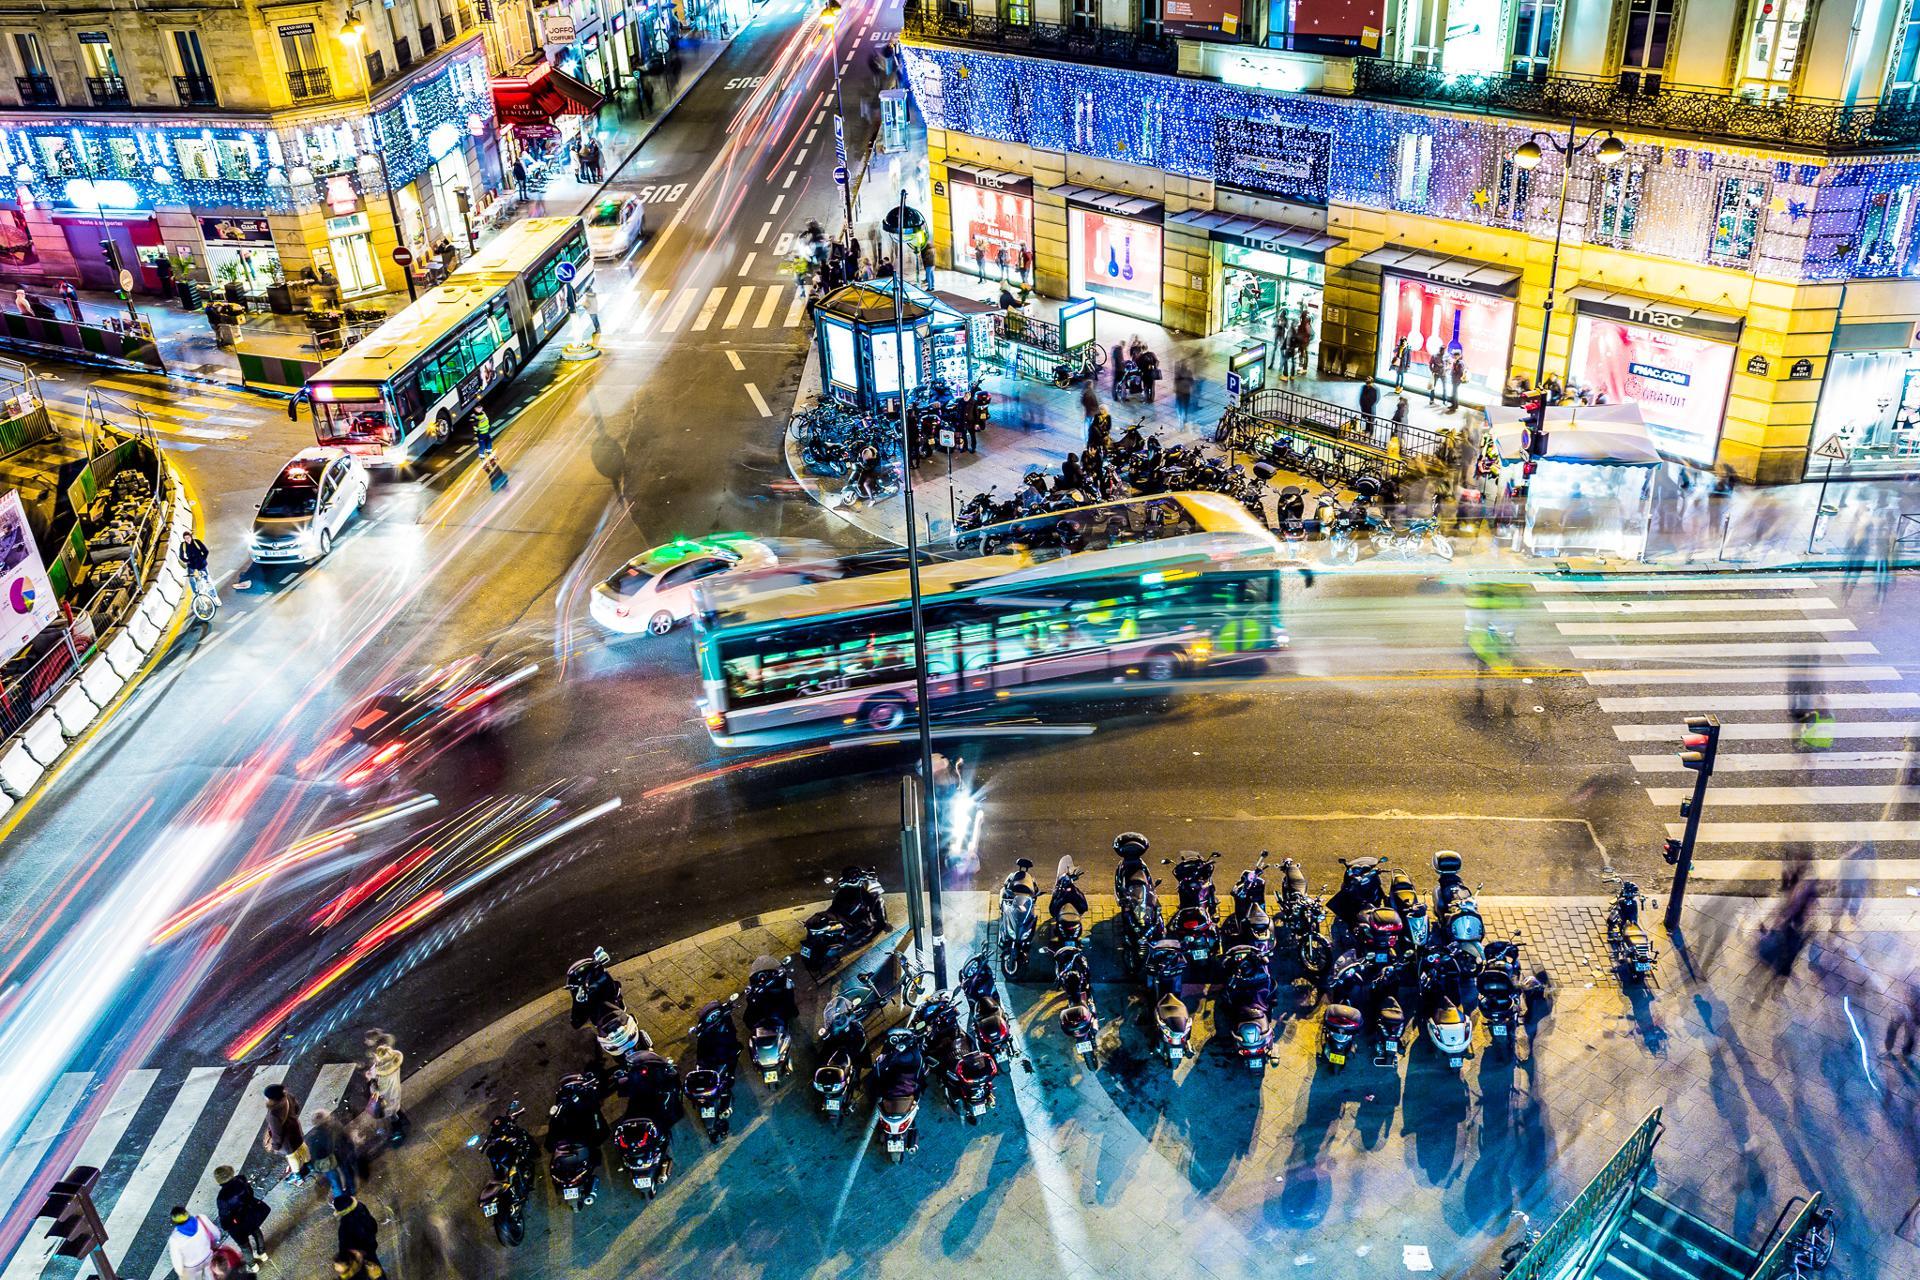 Saint-Lazare : Trafic de nuit